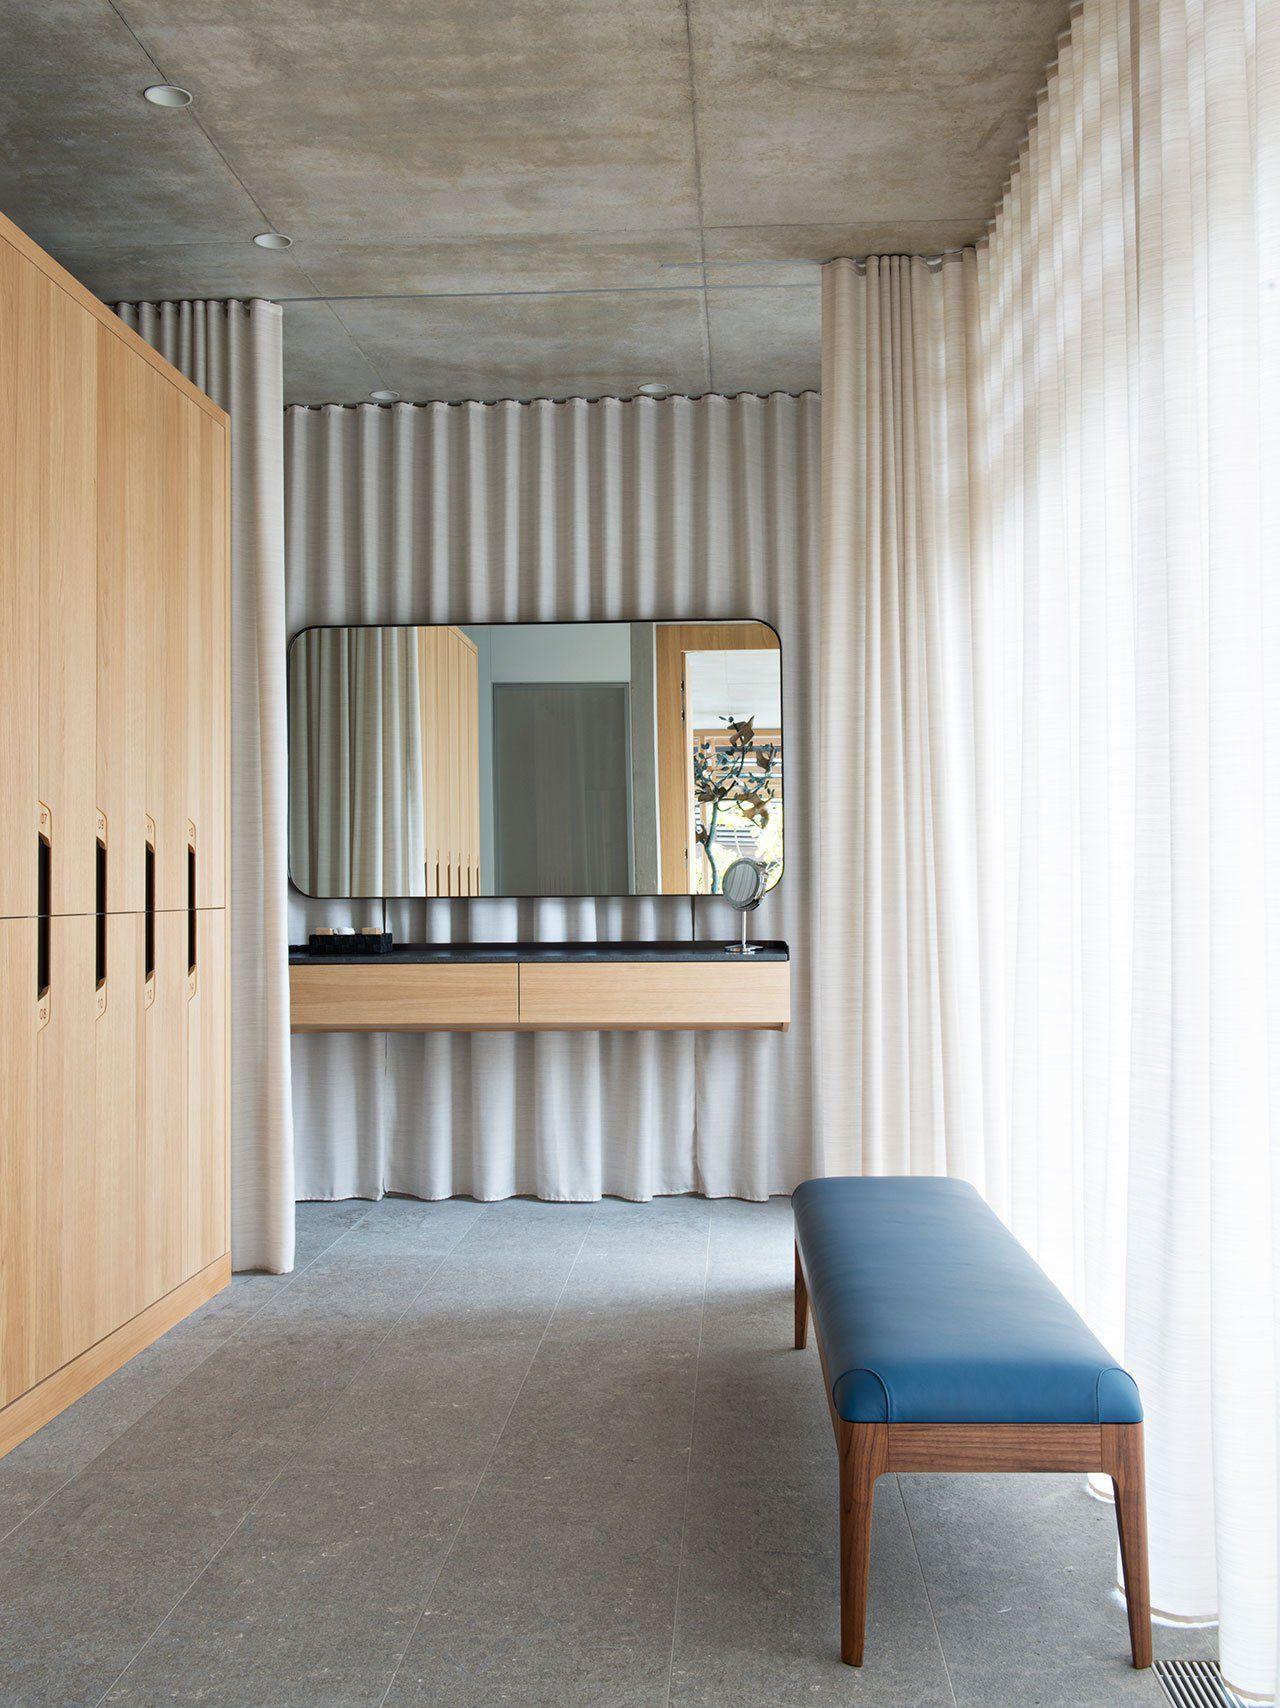 At Home In Alsace Hotel Des Berges Spa Des Saules Designed By Jouin Manku Yatzer Interior Design News Hotels Design Furniture Design